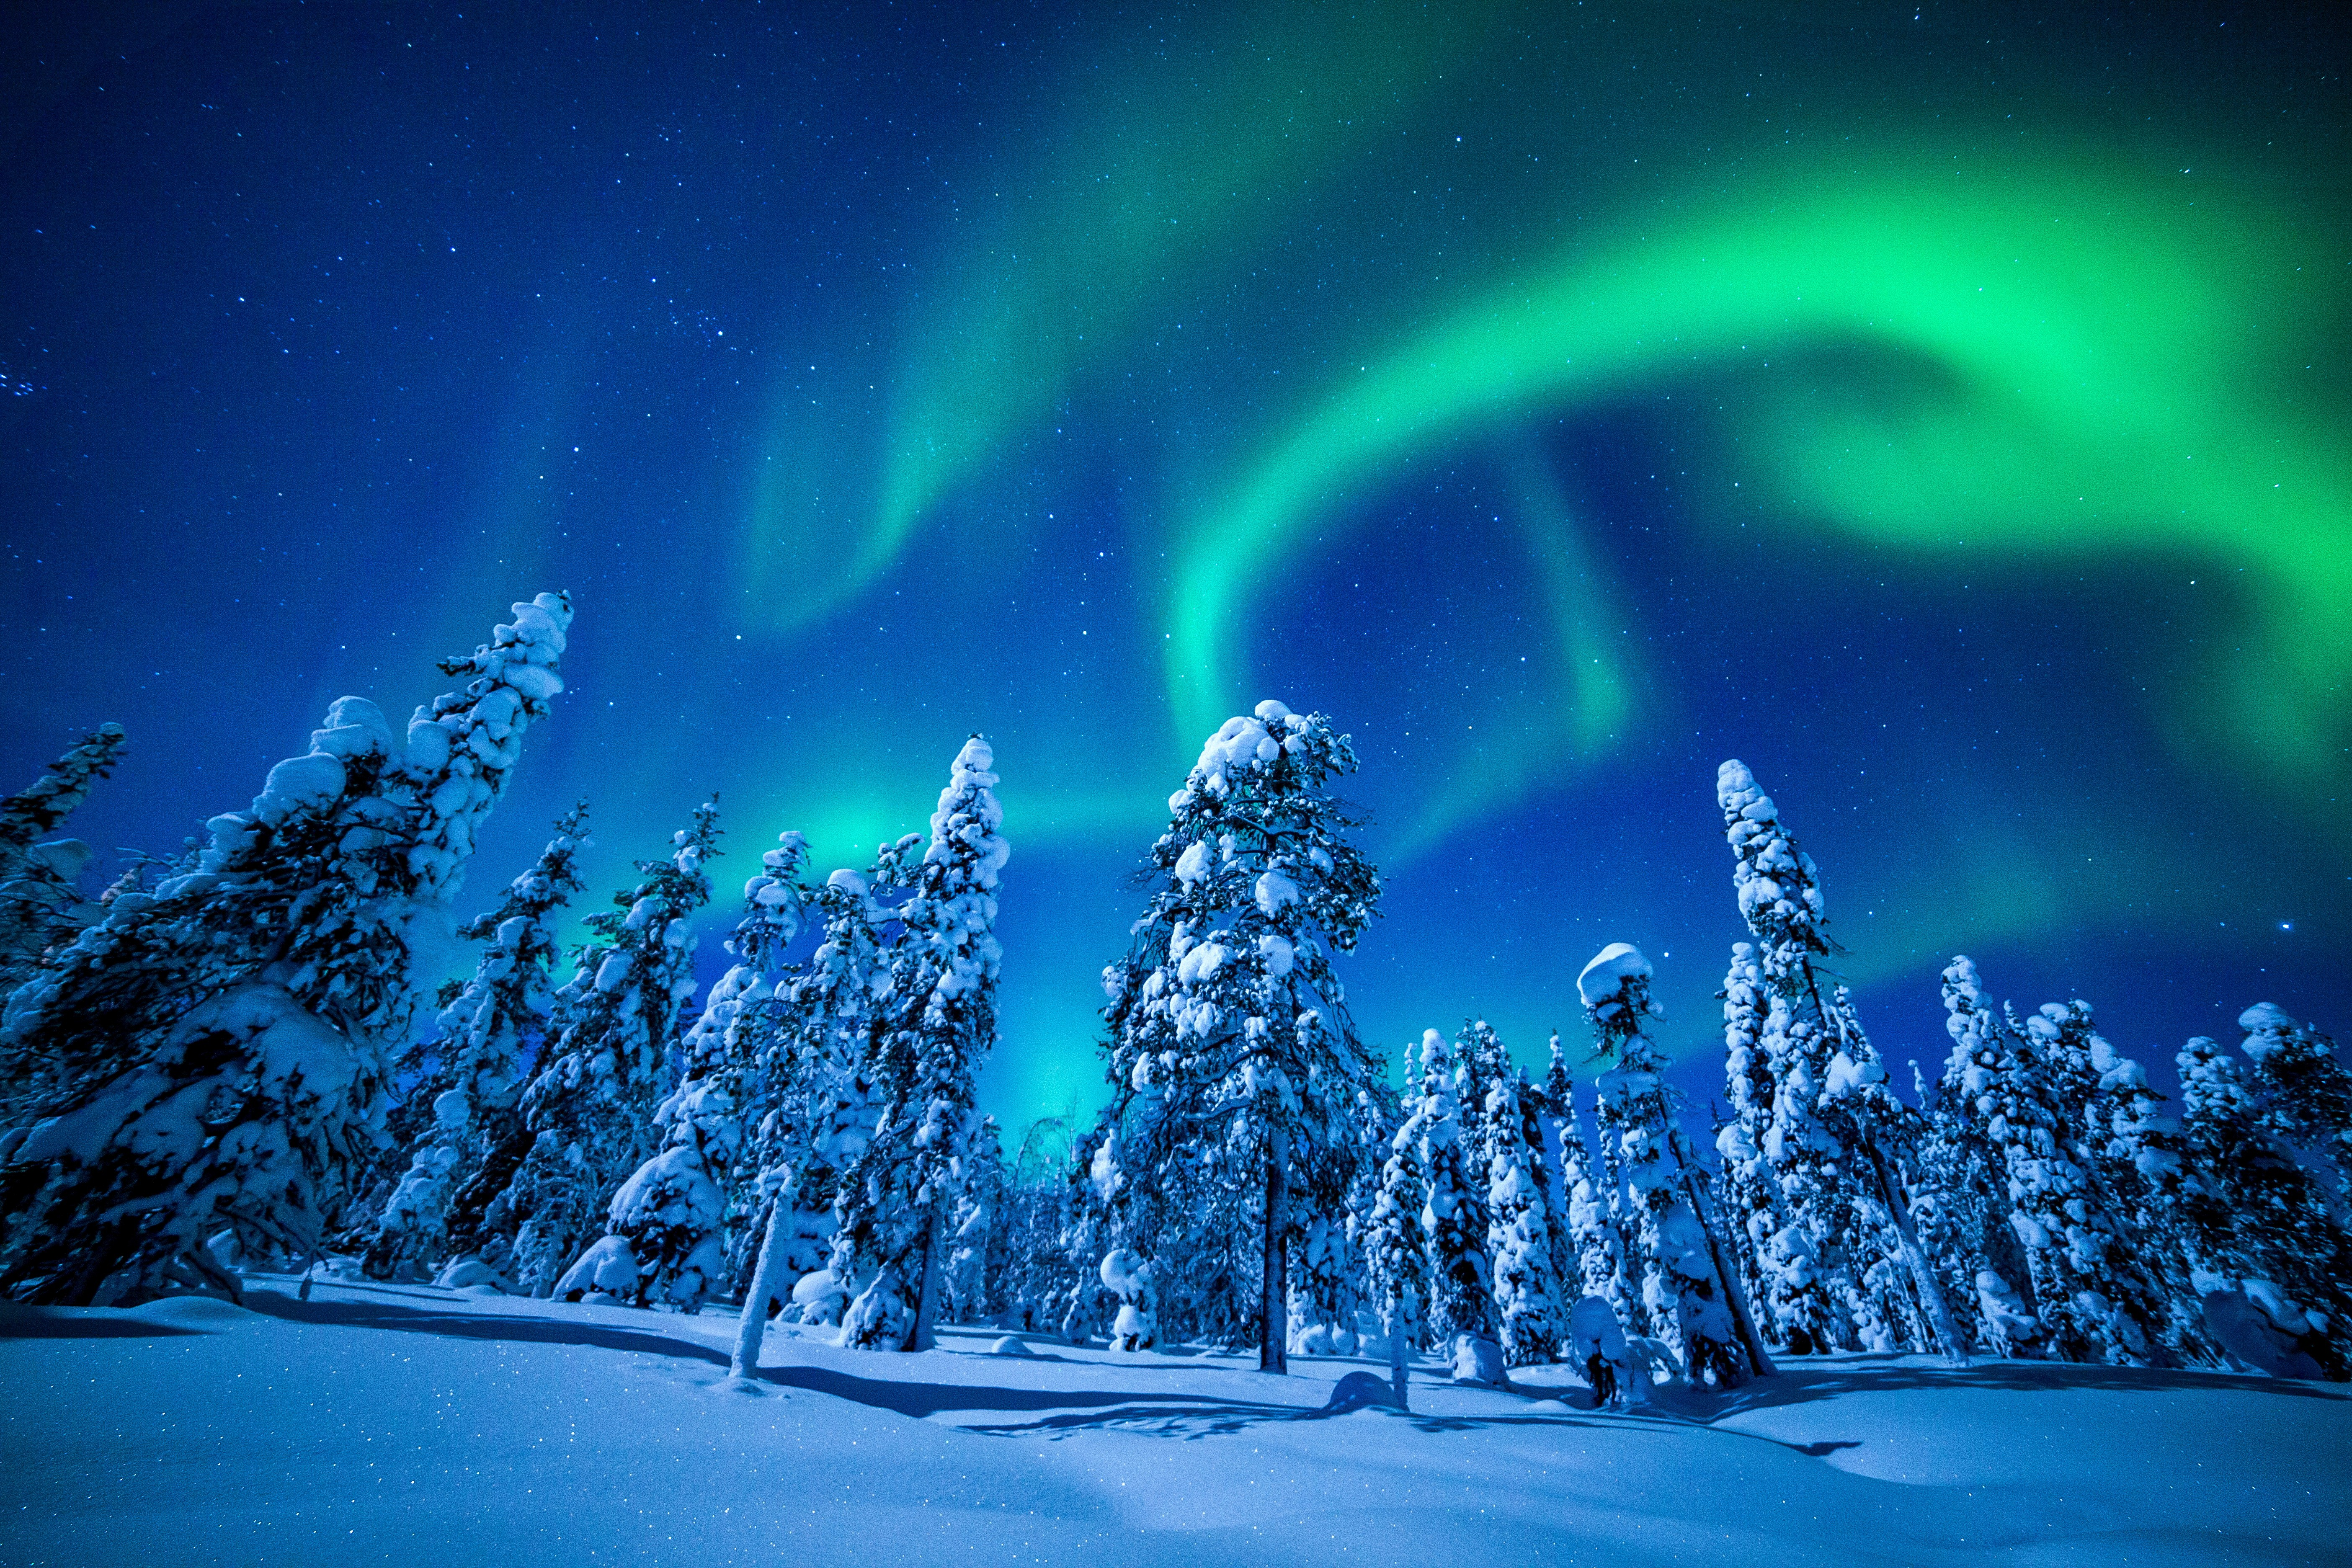 Aurora borealis 5k retina ultra hd wallpaper background for Sfondi desktop aurora boreale